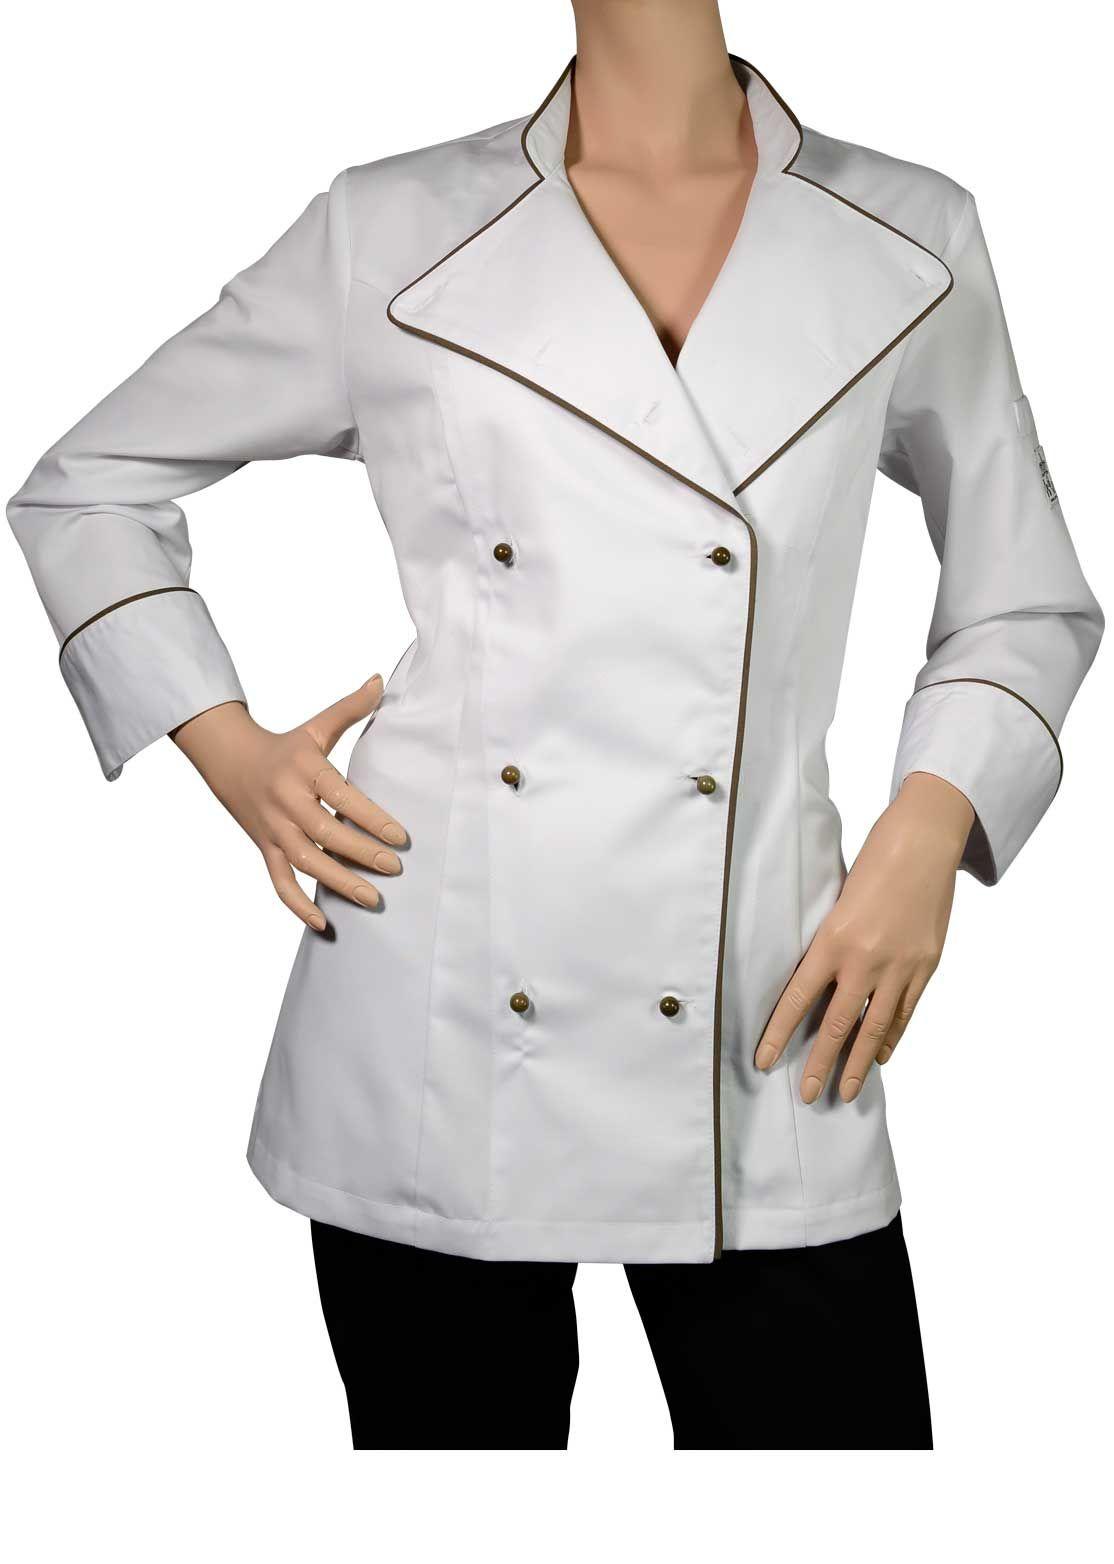 Verona lady jacket  chefworks  8d2ed1686292